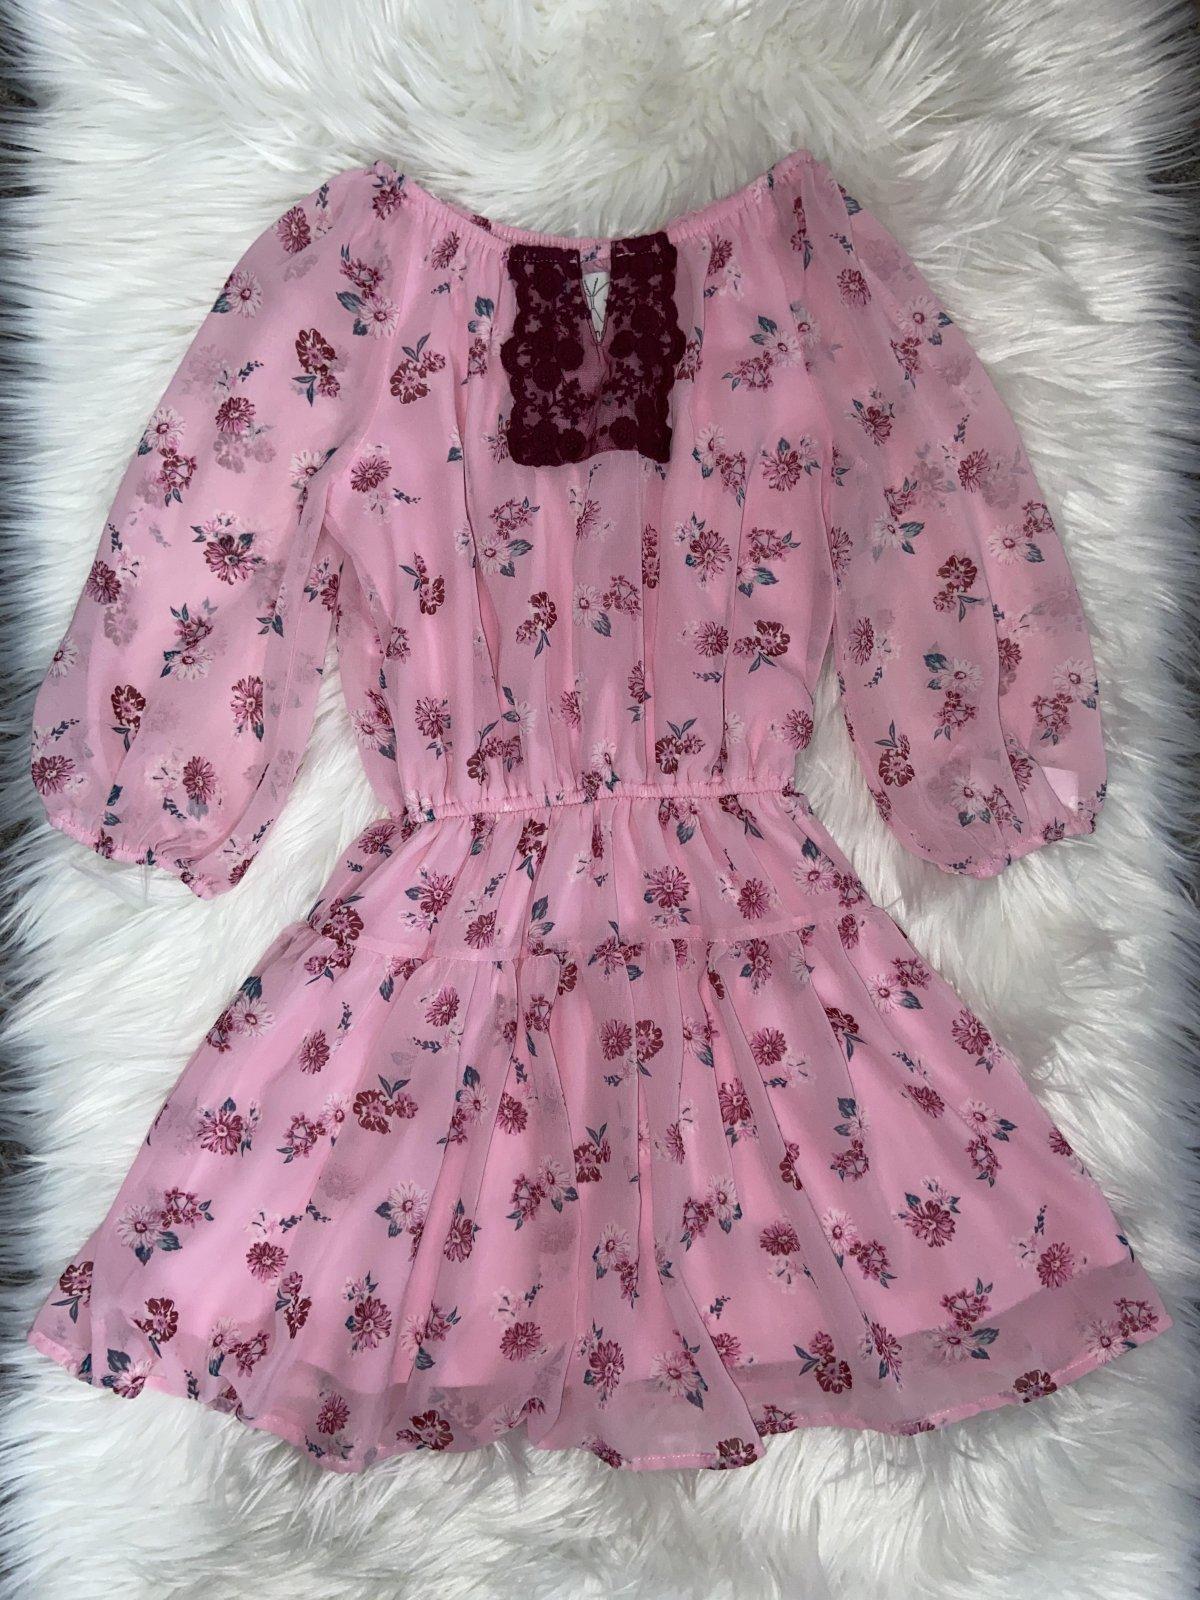 Ella Moss Long Sleeve Romper Pink Girls Size 8